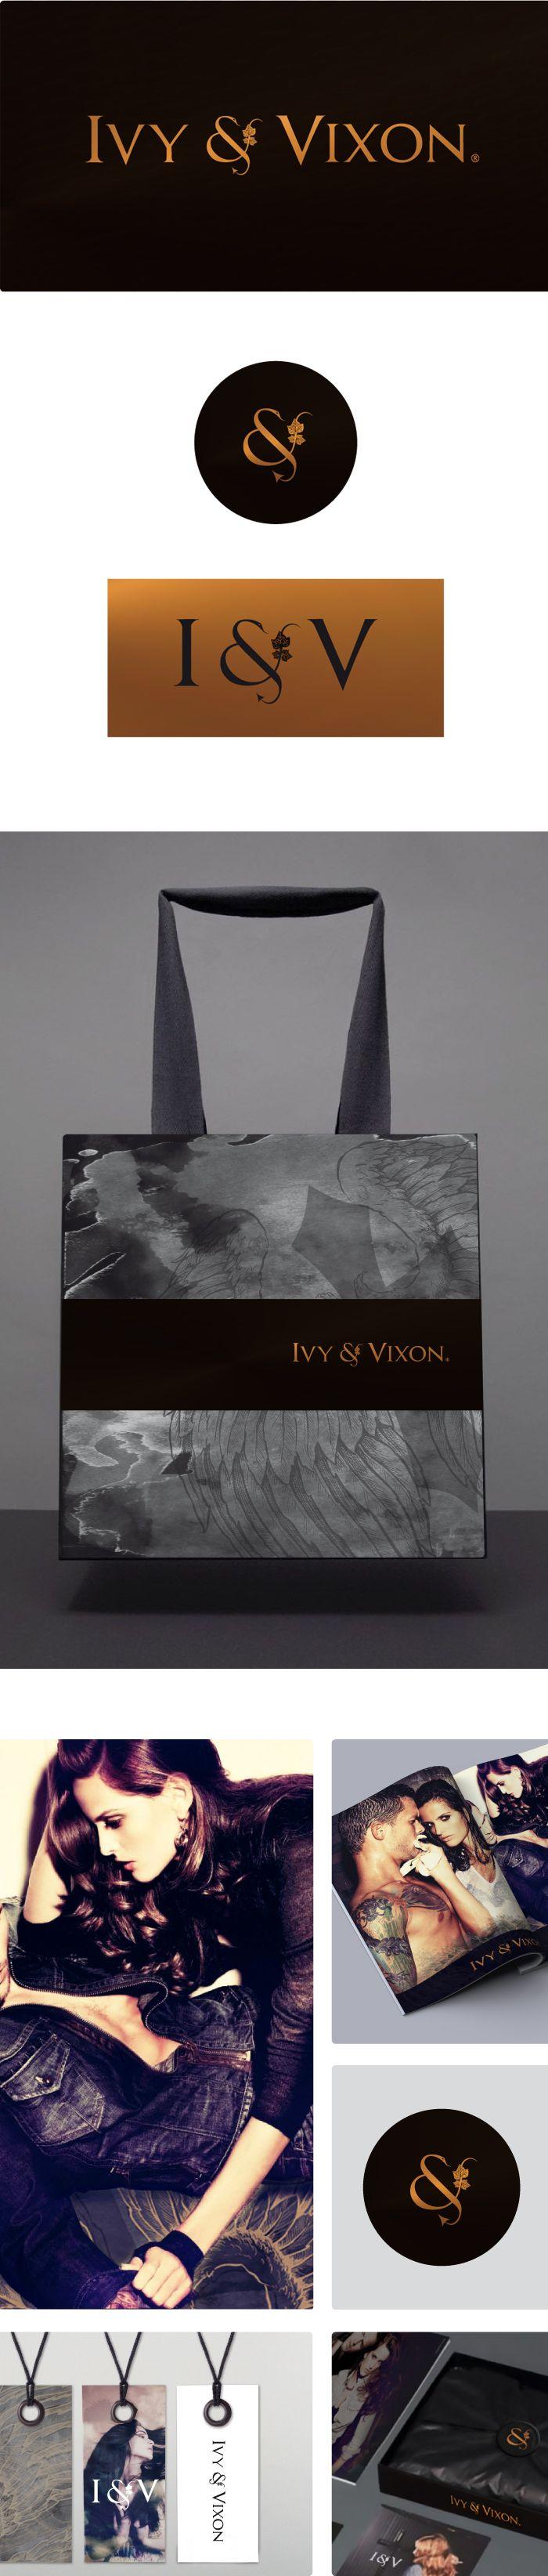 Ivy + Vixon - Clothing label brand development